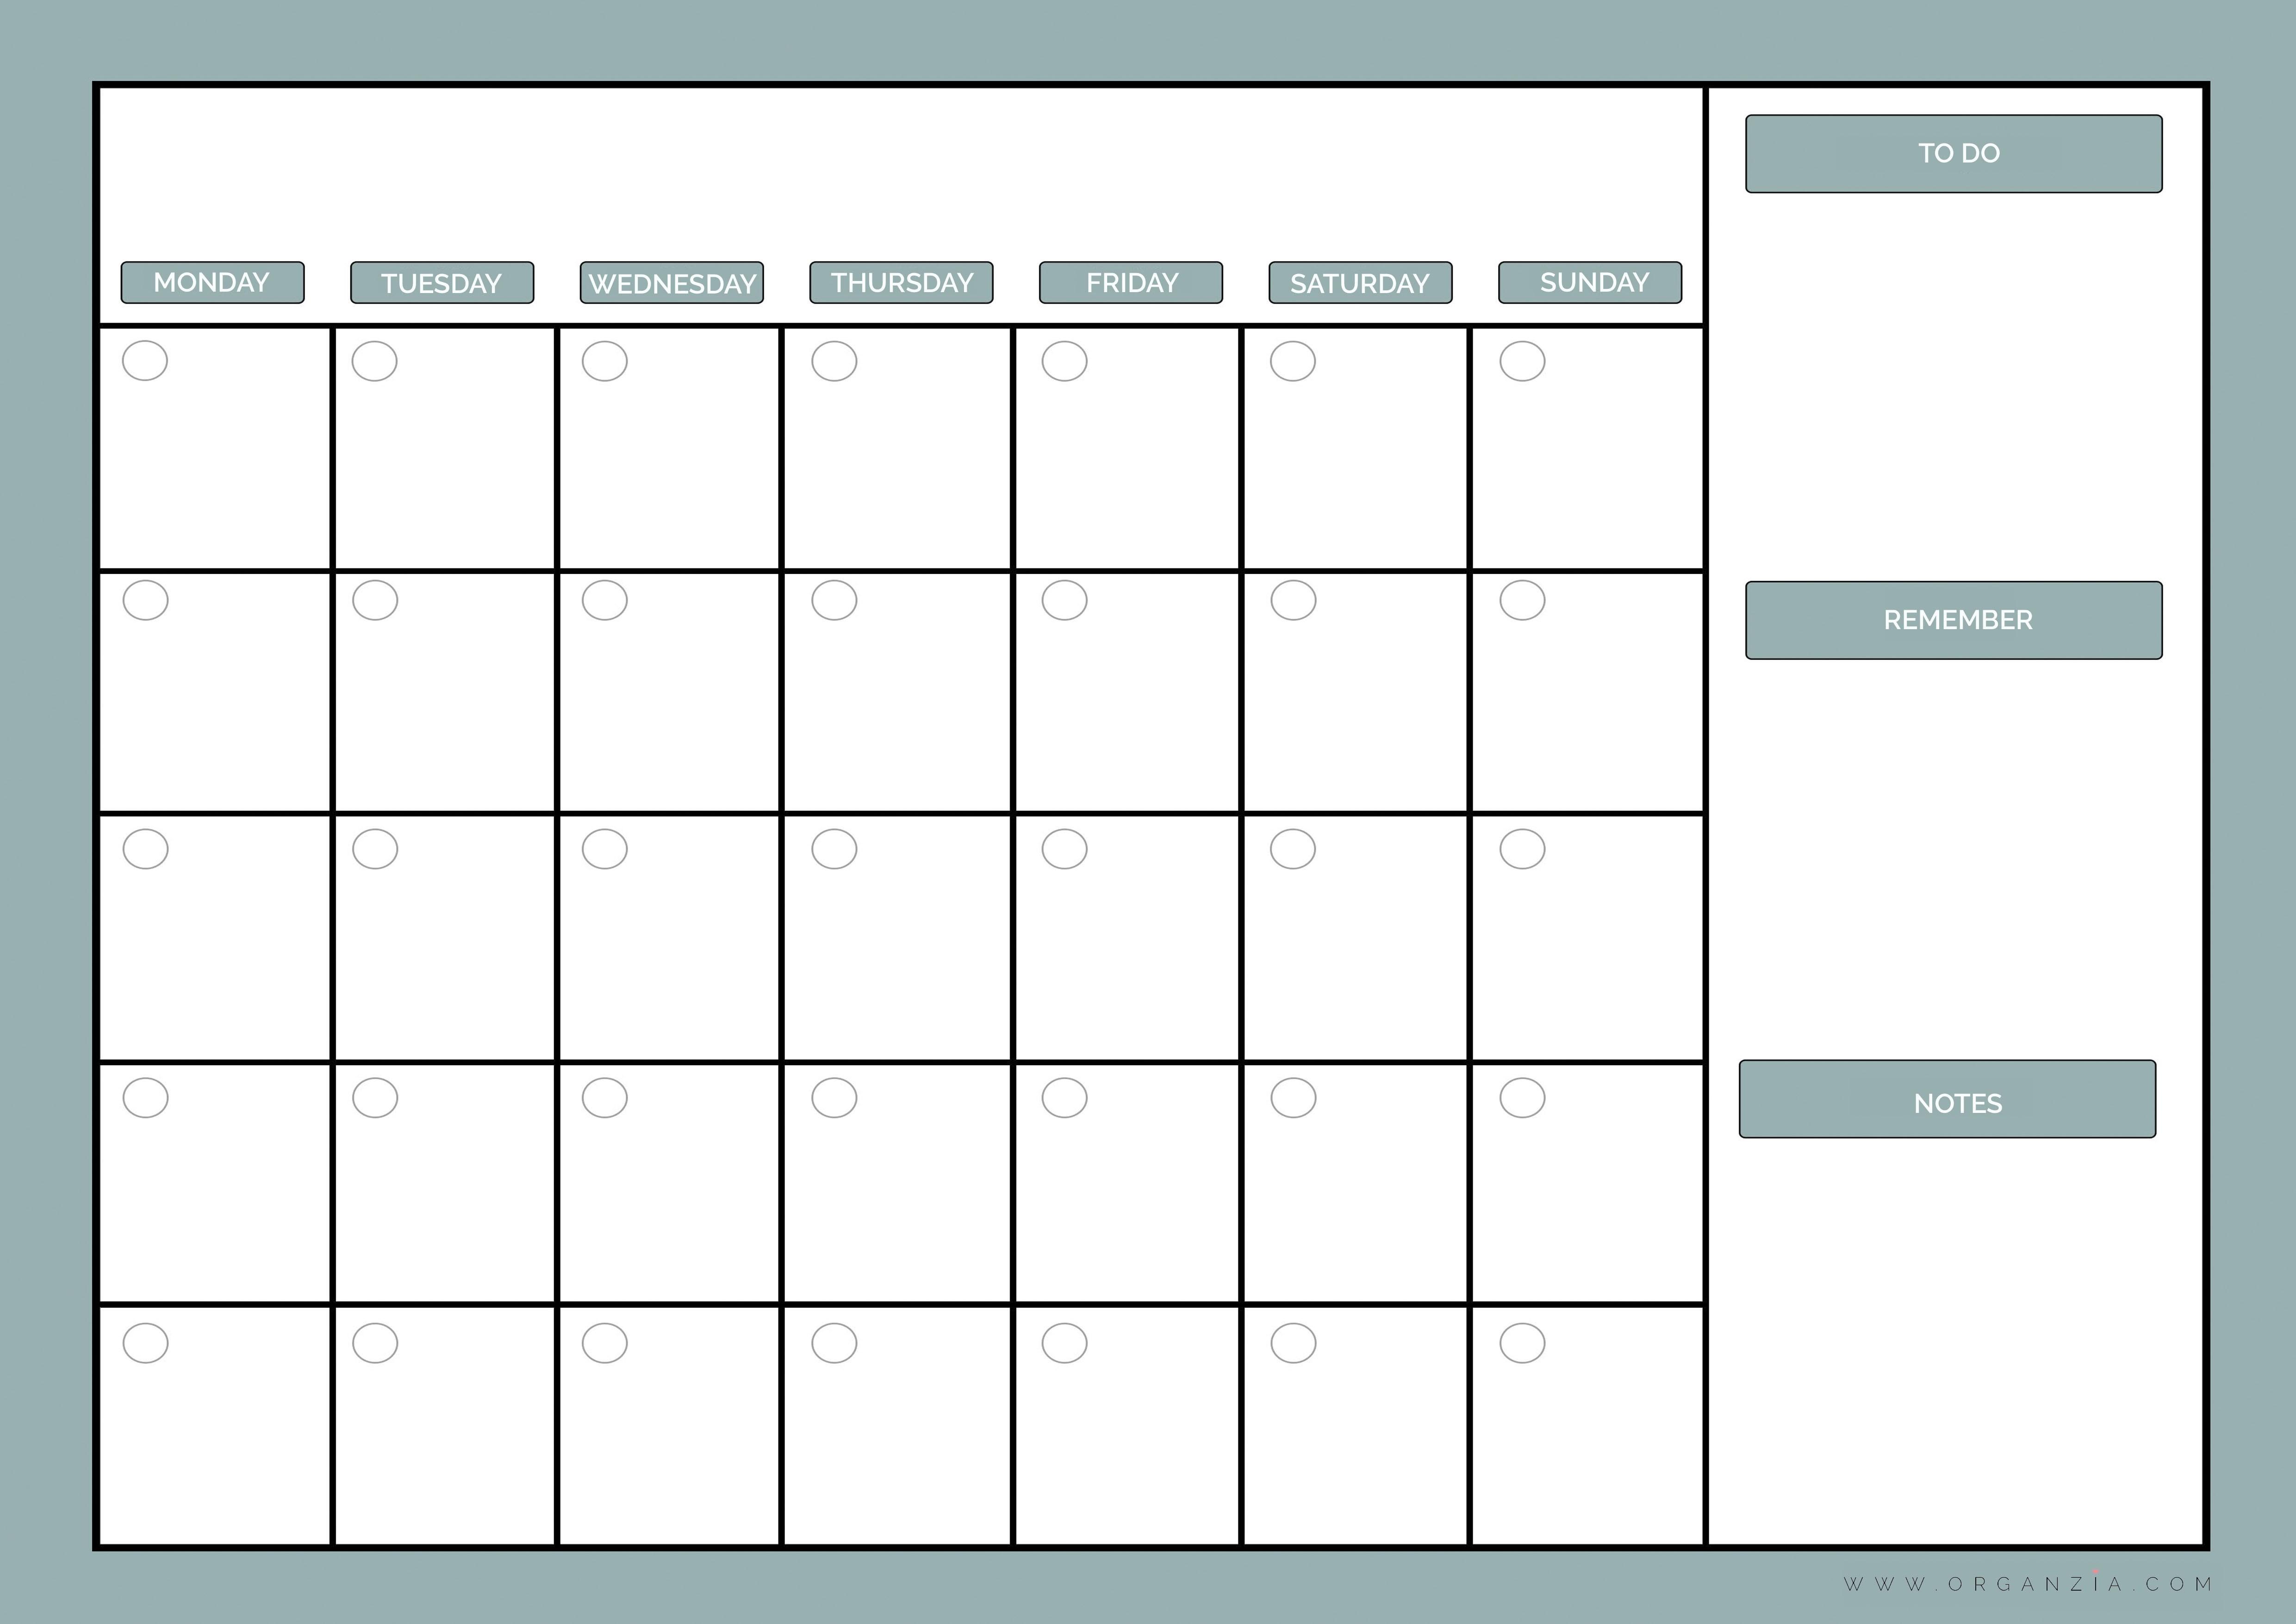 Printable Monthly Planner Calendar Diy Monthly Planner Dry Erase - Free Printable Monthly Planner